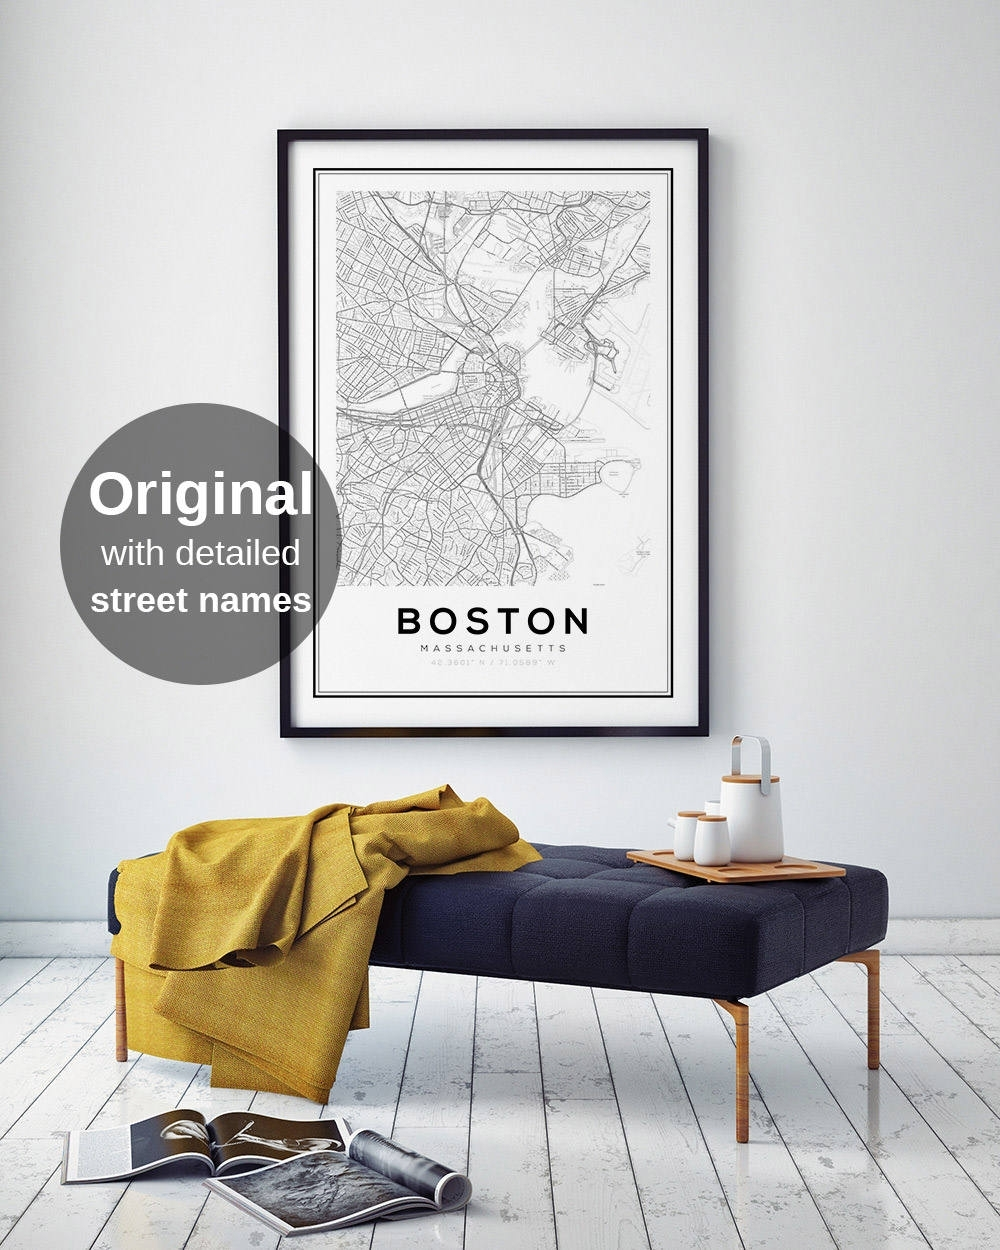 Boston Map Print, City Map Decor, City Map Wall Art, Massachusetts Intended For Boston Wall Art (View 5 of 20)